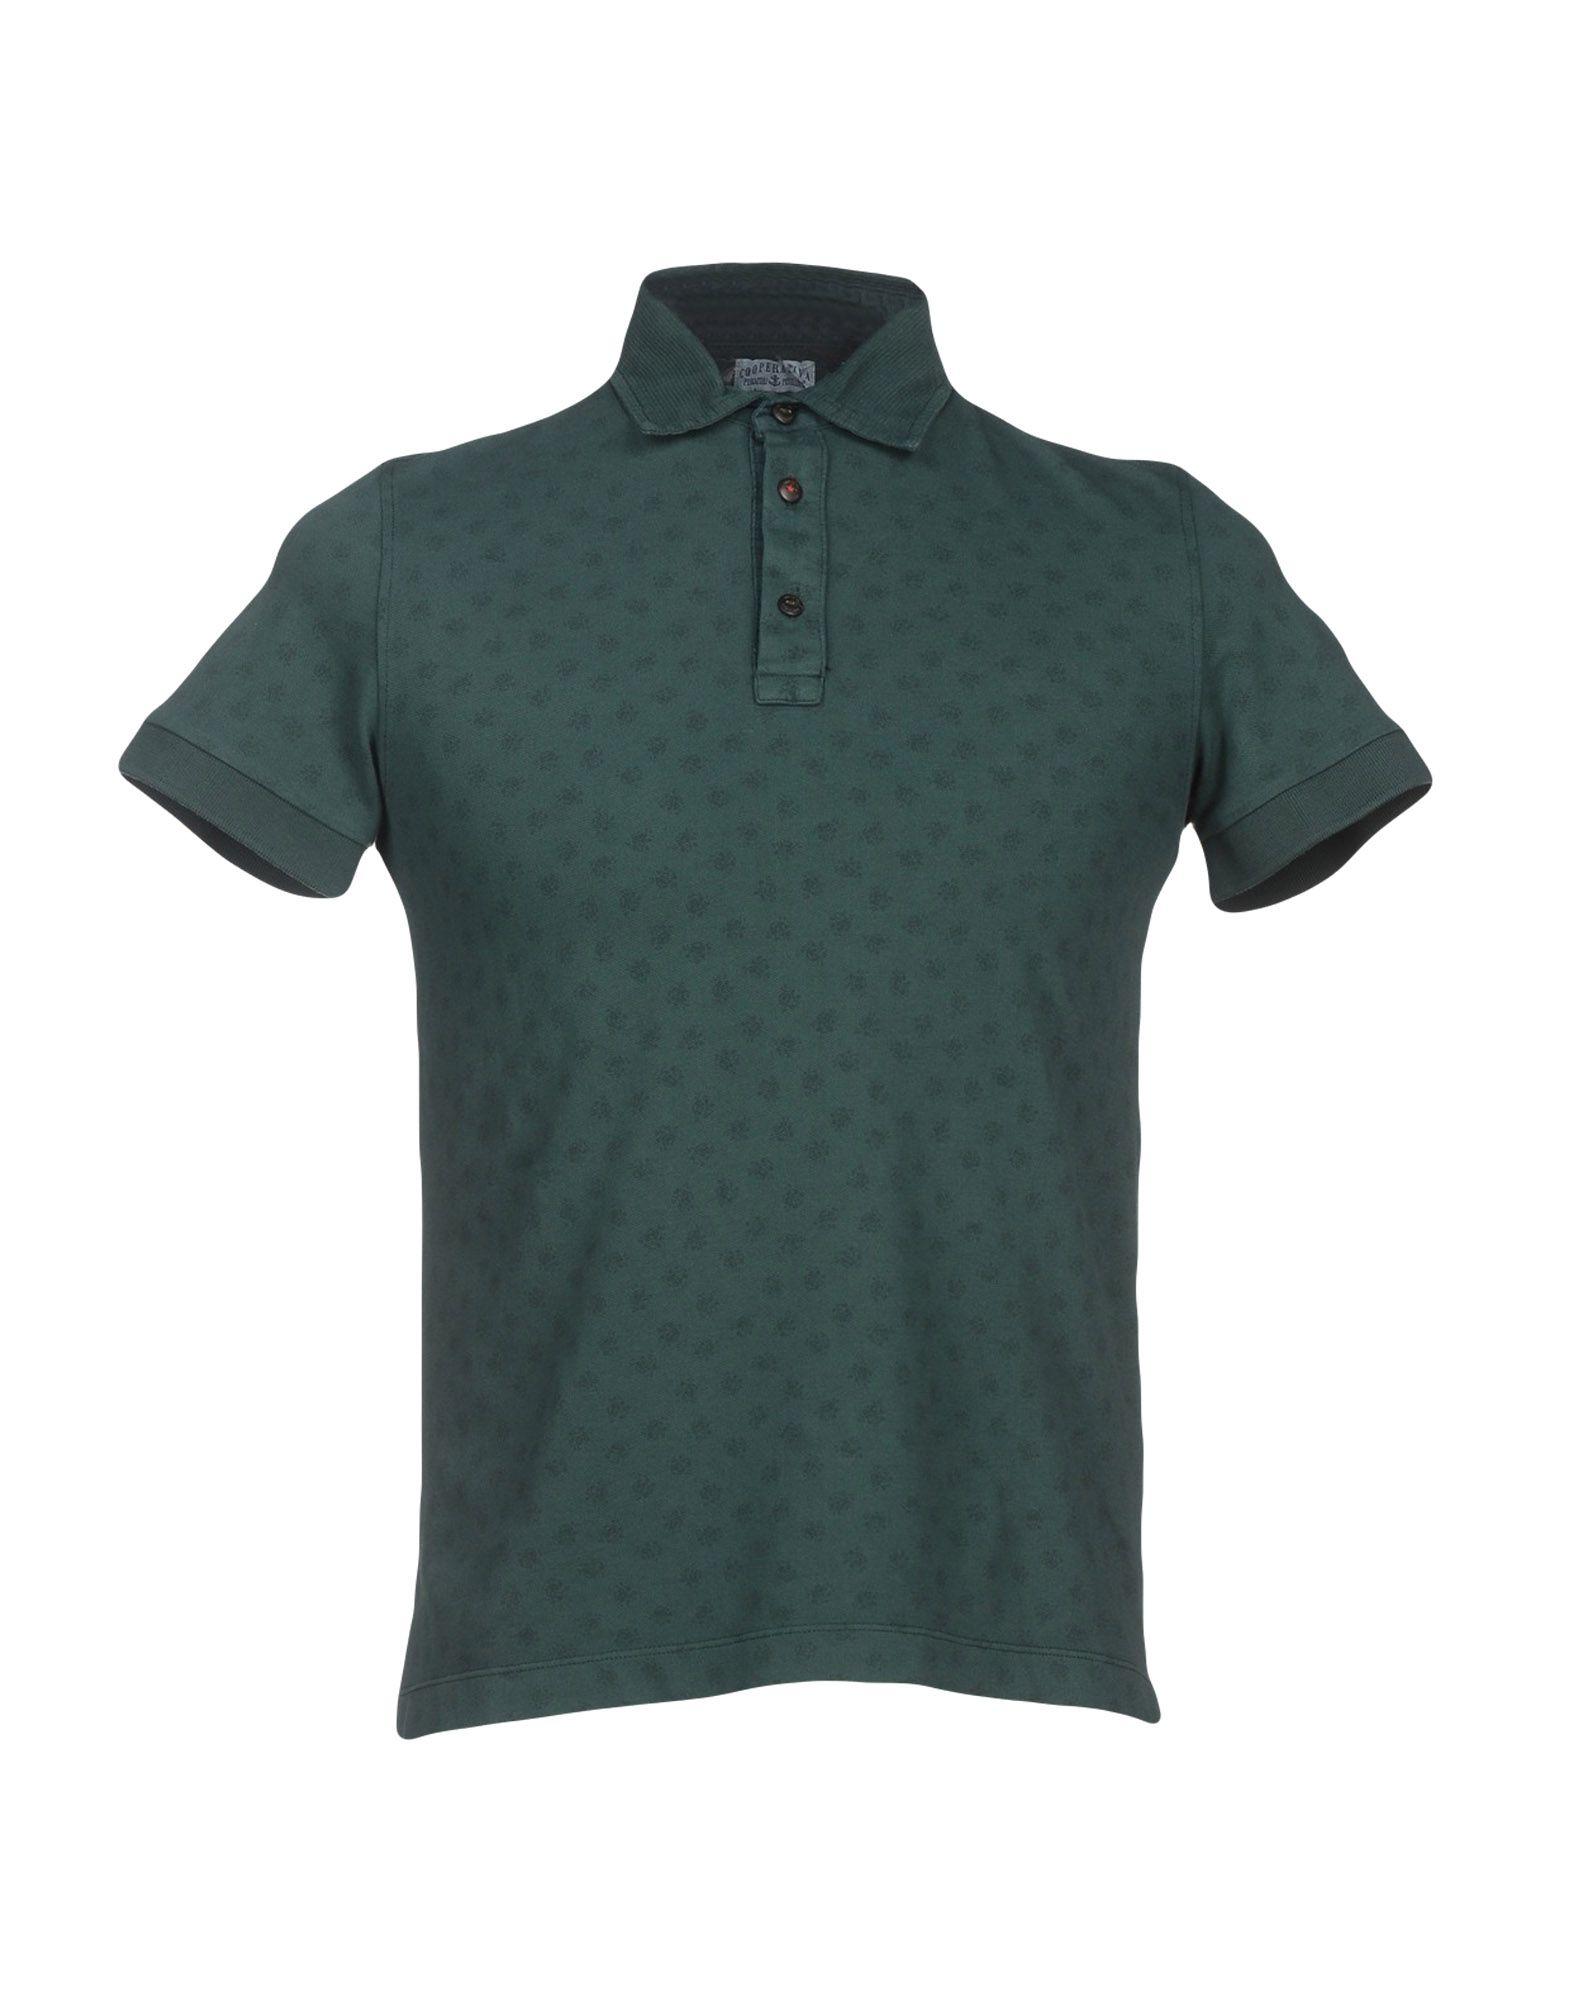 Cooperativa pescatori posillipo polo shirt in green for for Dark green mens polo shirt